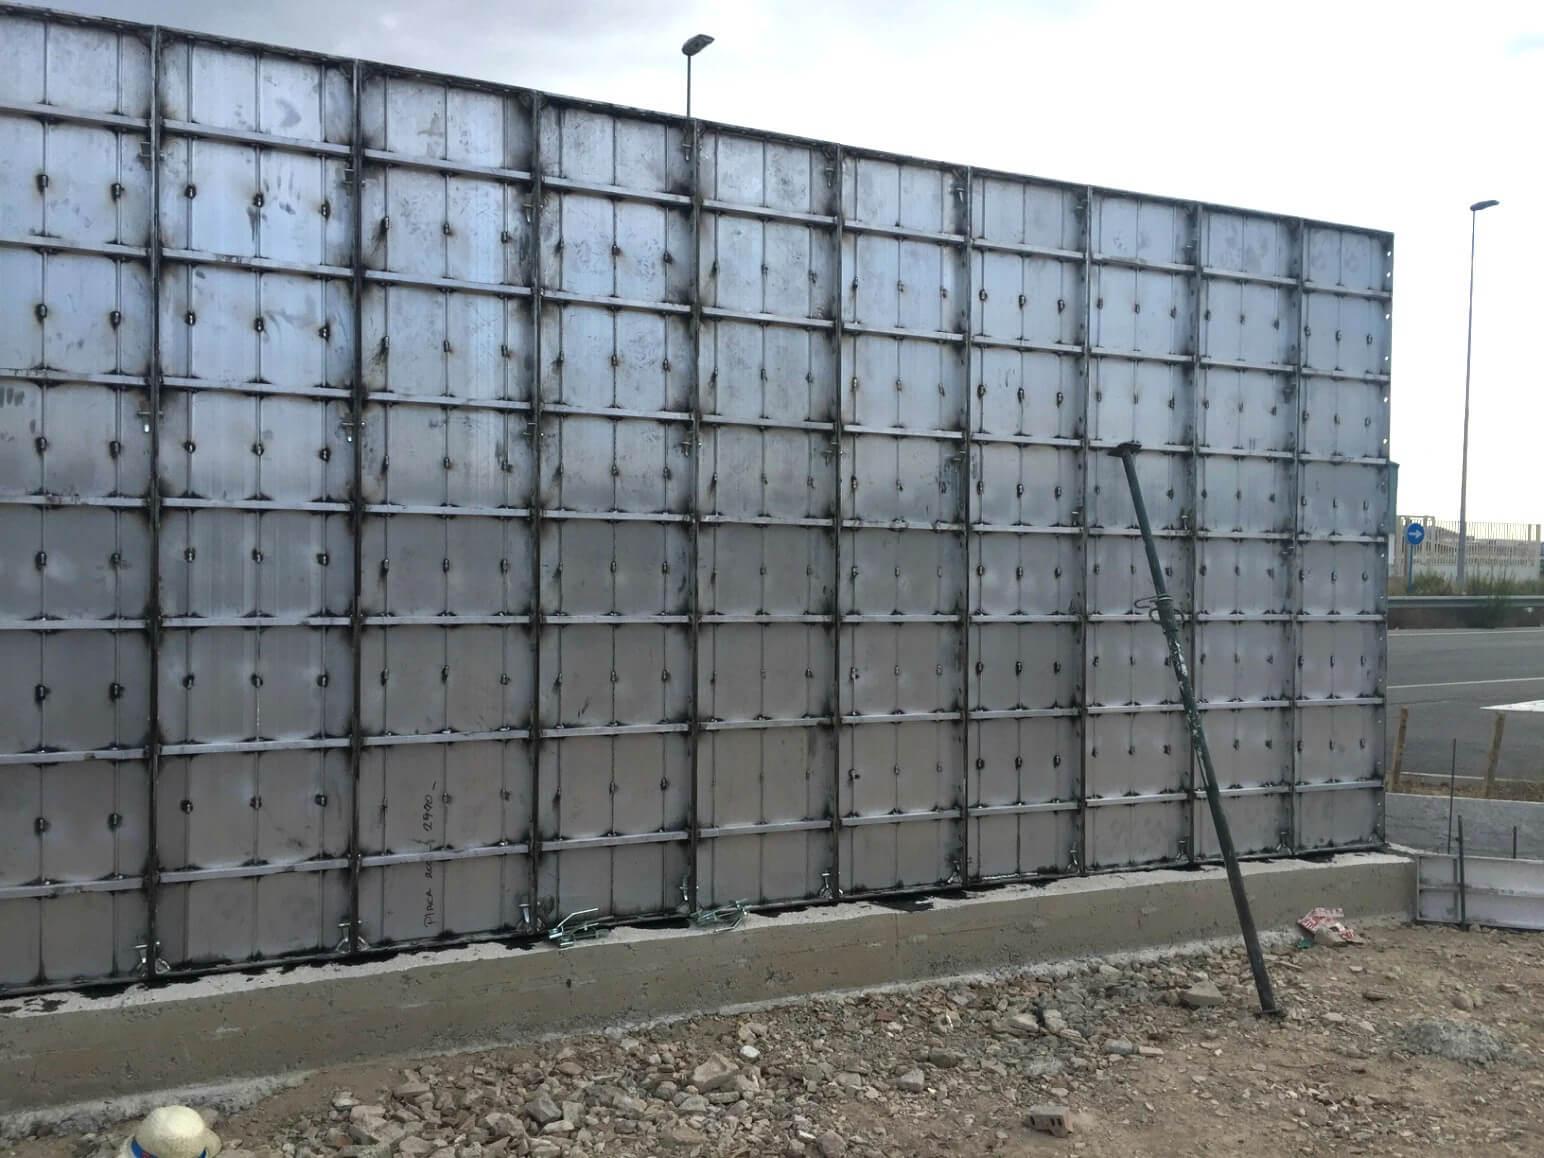 proyecto muro perimetral encofrados de aluminio construccion strong forms alicante 6